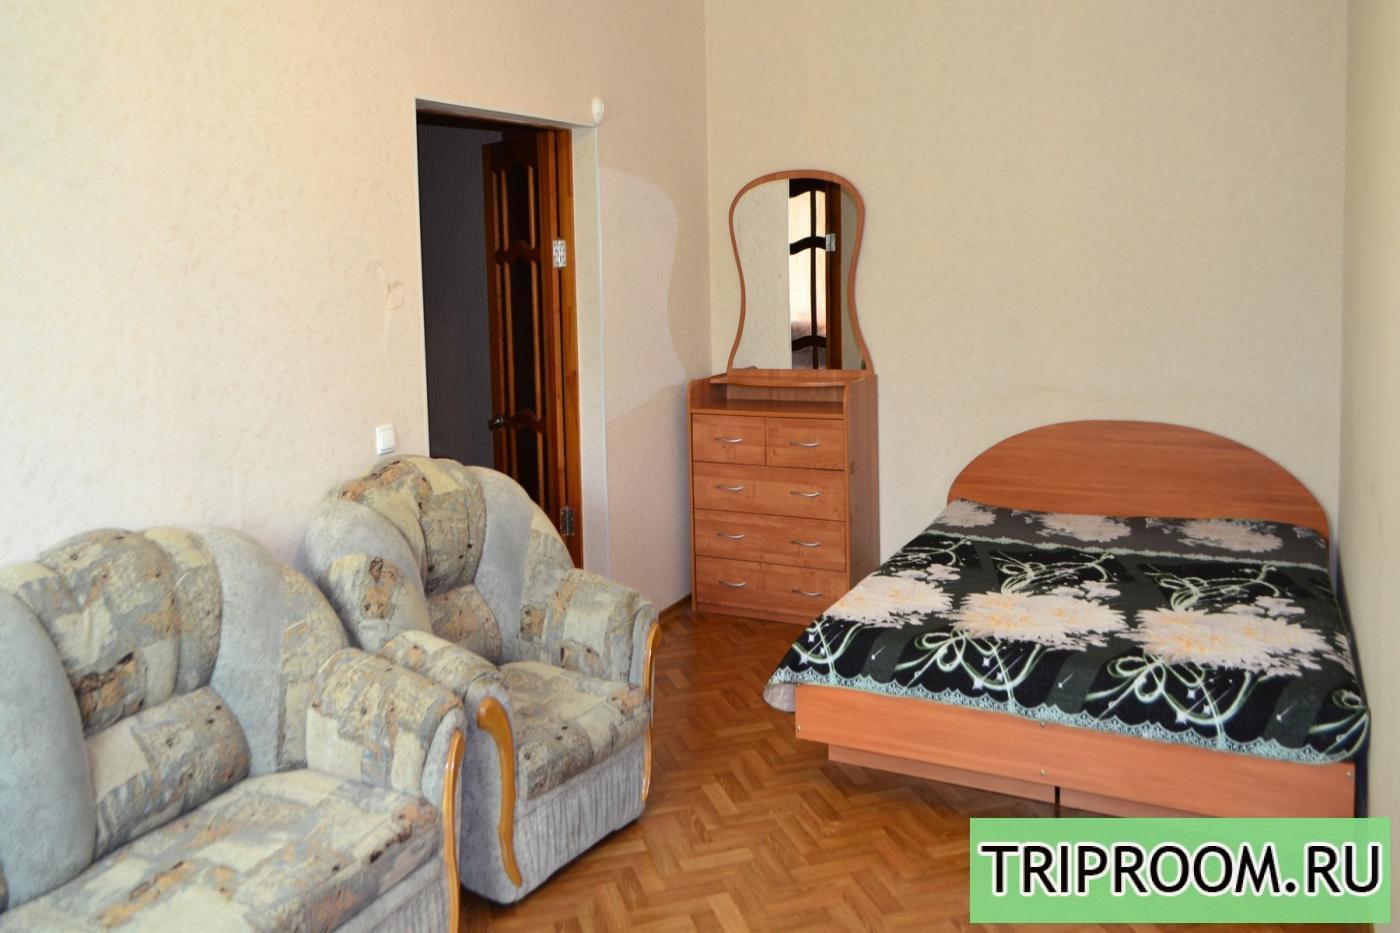 1-комнатная квартира посуточно (вариант № 12444), ул. Рихарда Зорге улица, фото № 1